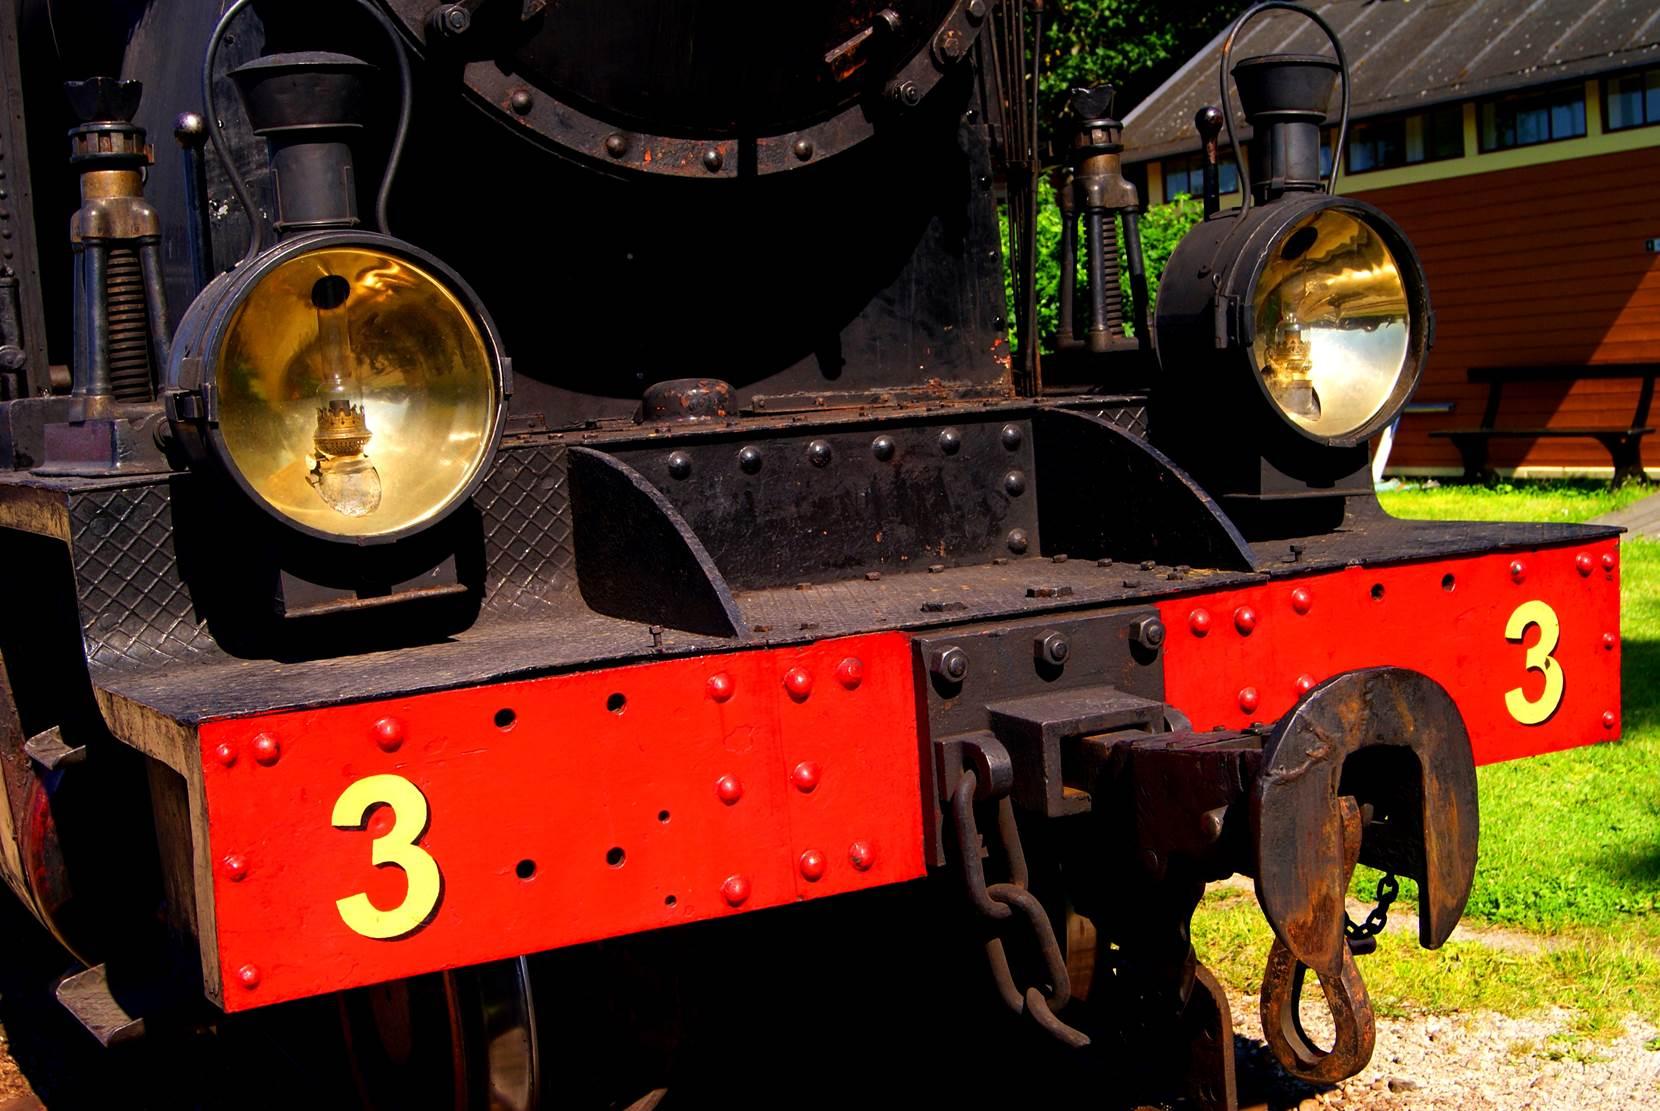 Detalles del tren a vapor, isla de Gotland, Suecia